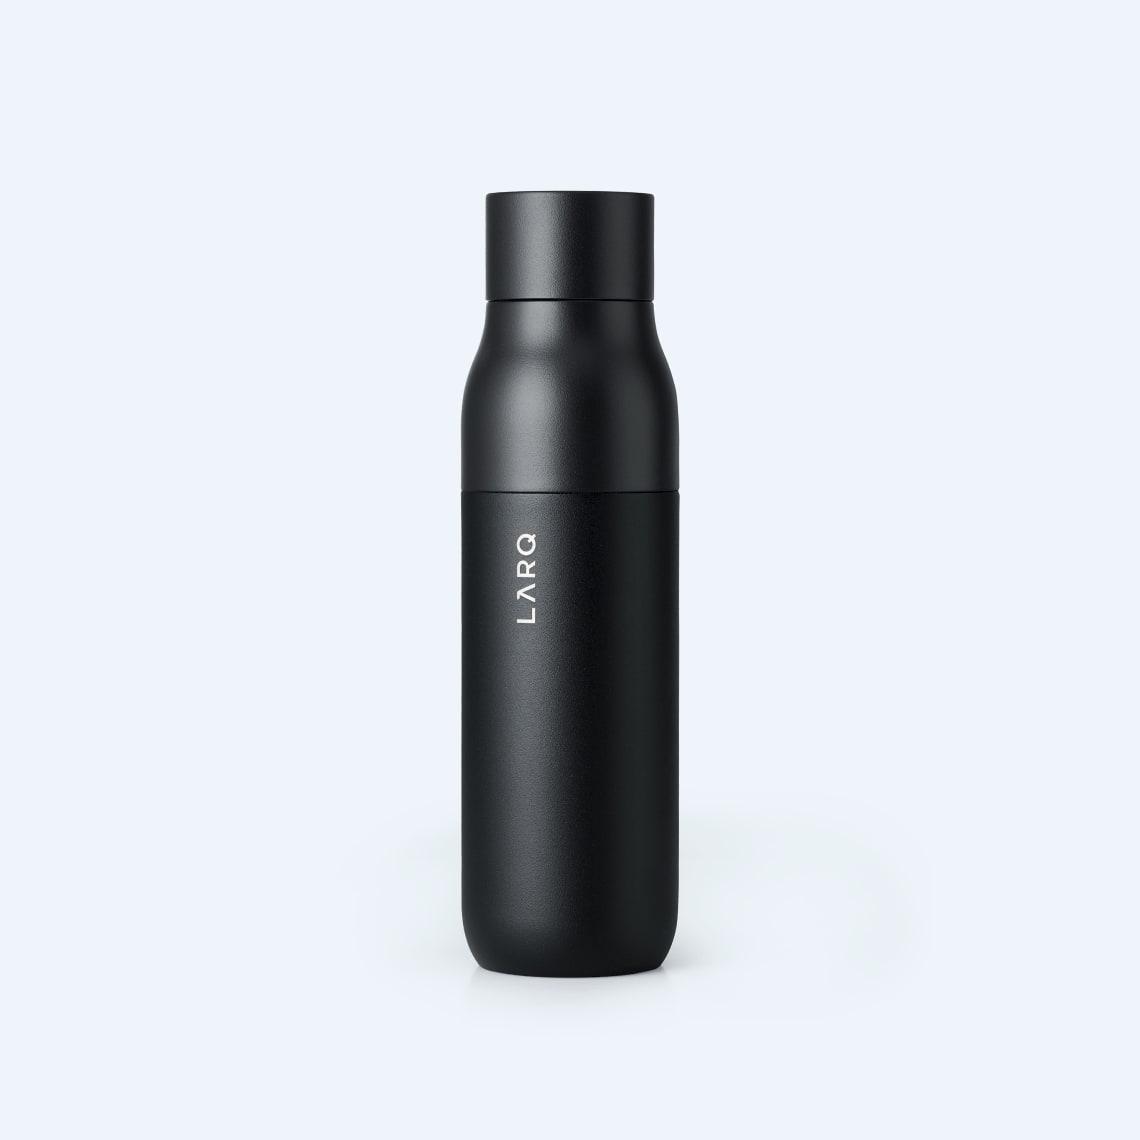 LARQ Bottle PureVis - Obsidian Black 17 oz